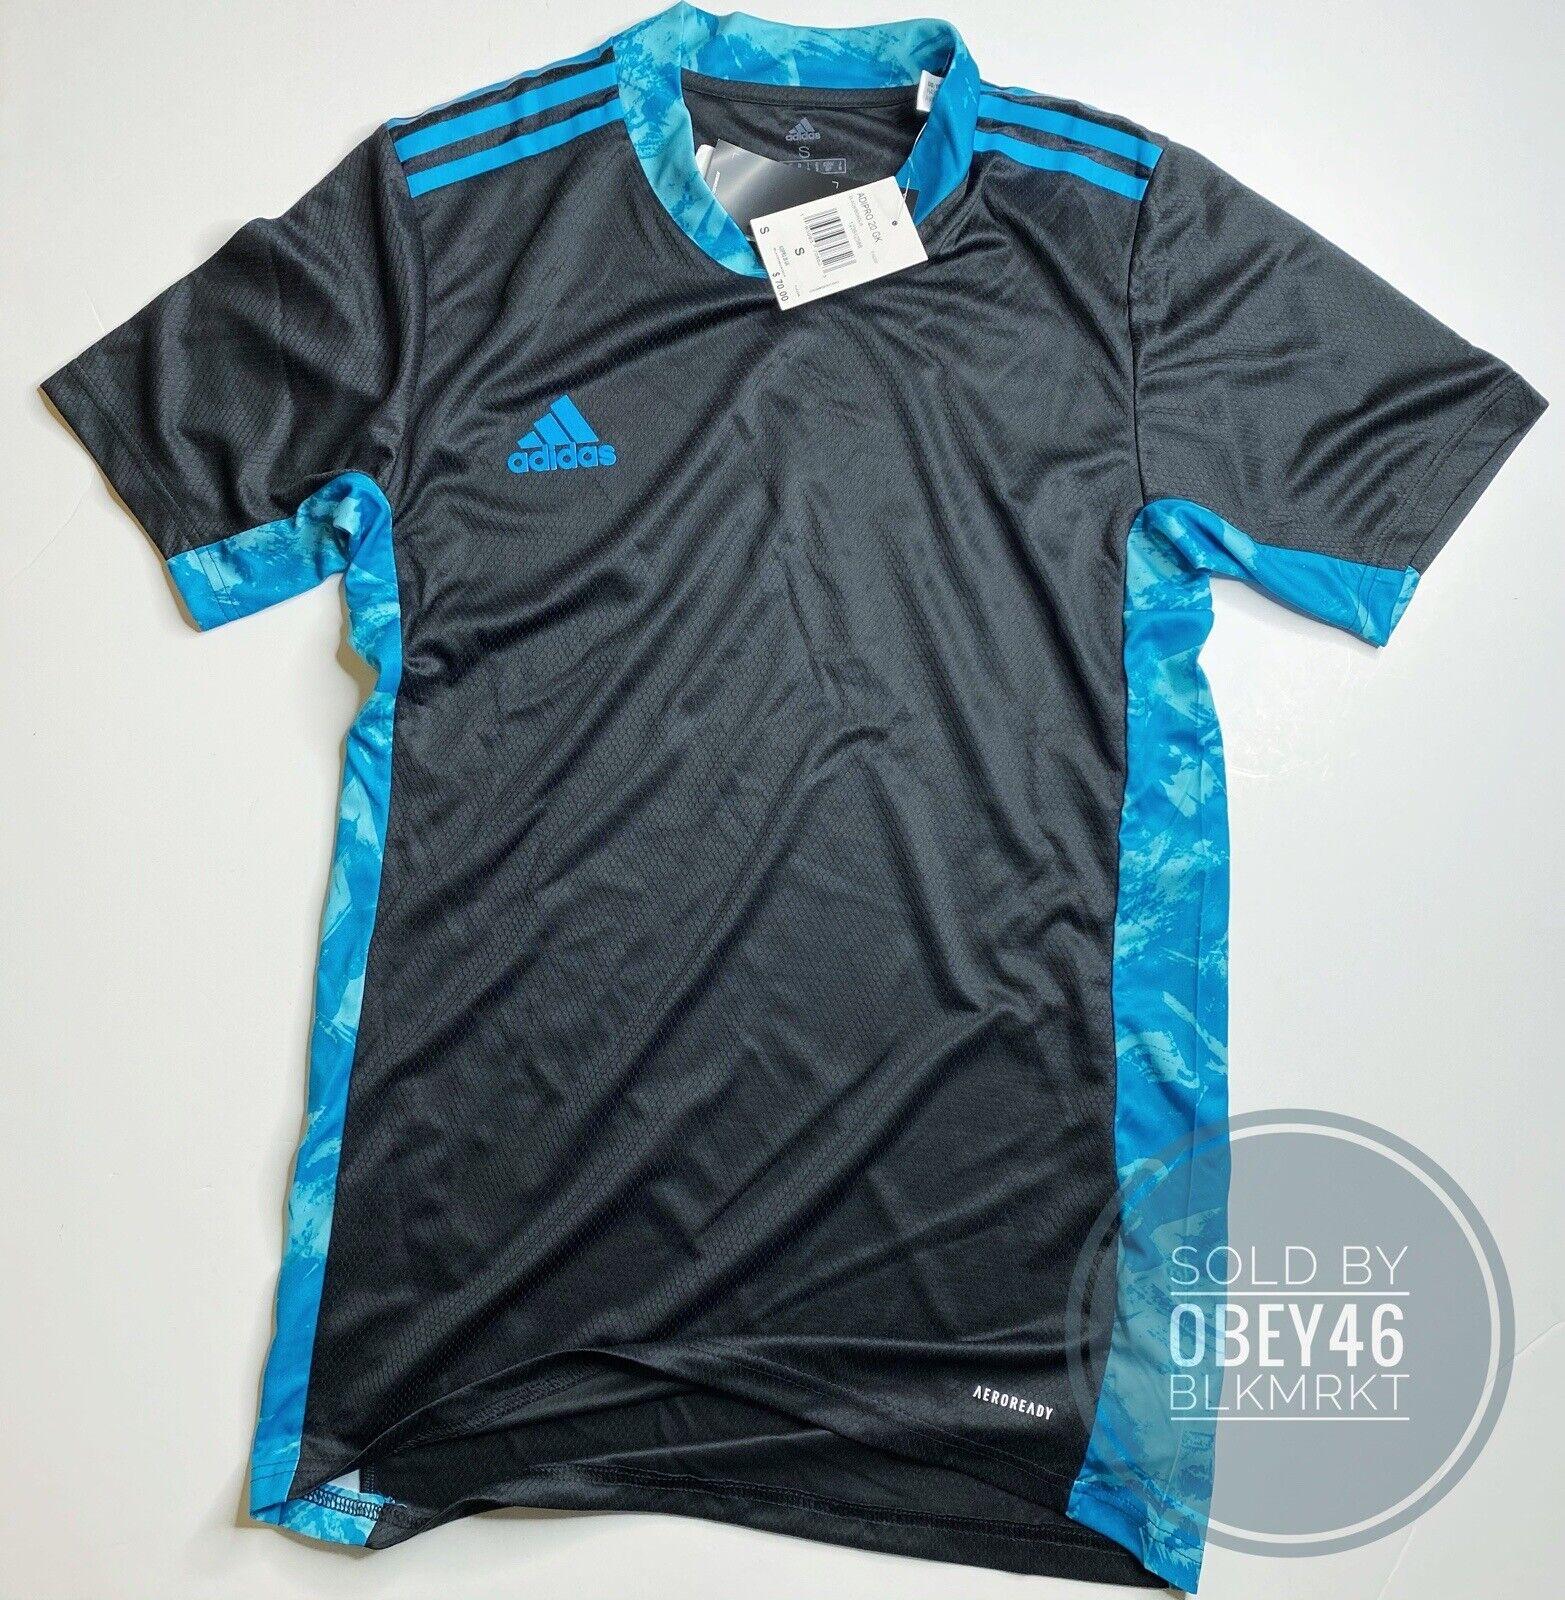 adidas Adipro 20 GK M Fi4205 Goalkeeper Jersey Shirt Black Aqua Sz ...